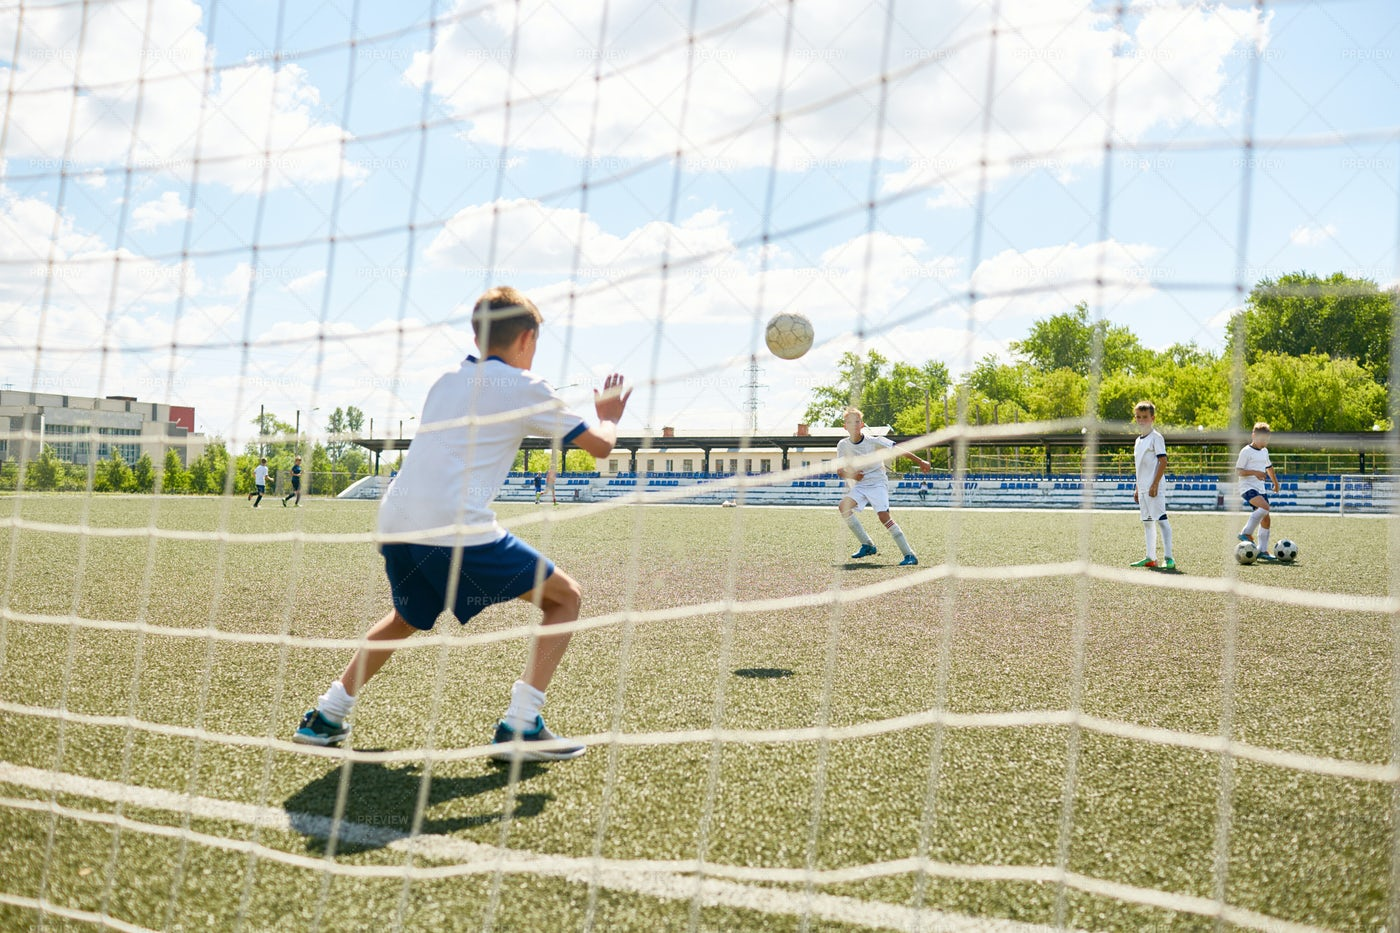 Junior Team Goalkeeper: Stock Photos